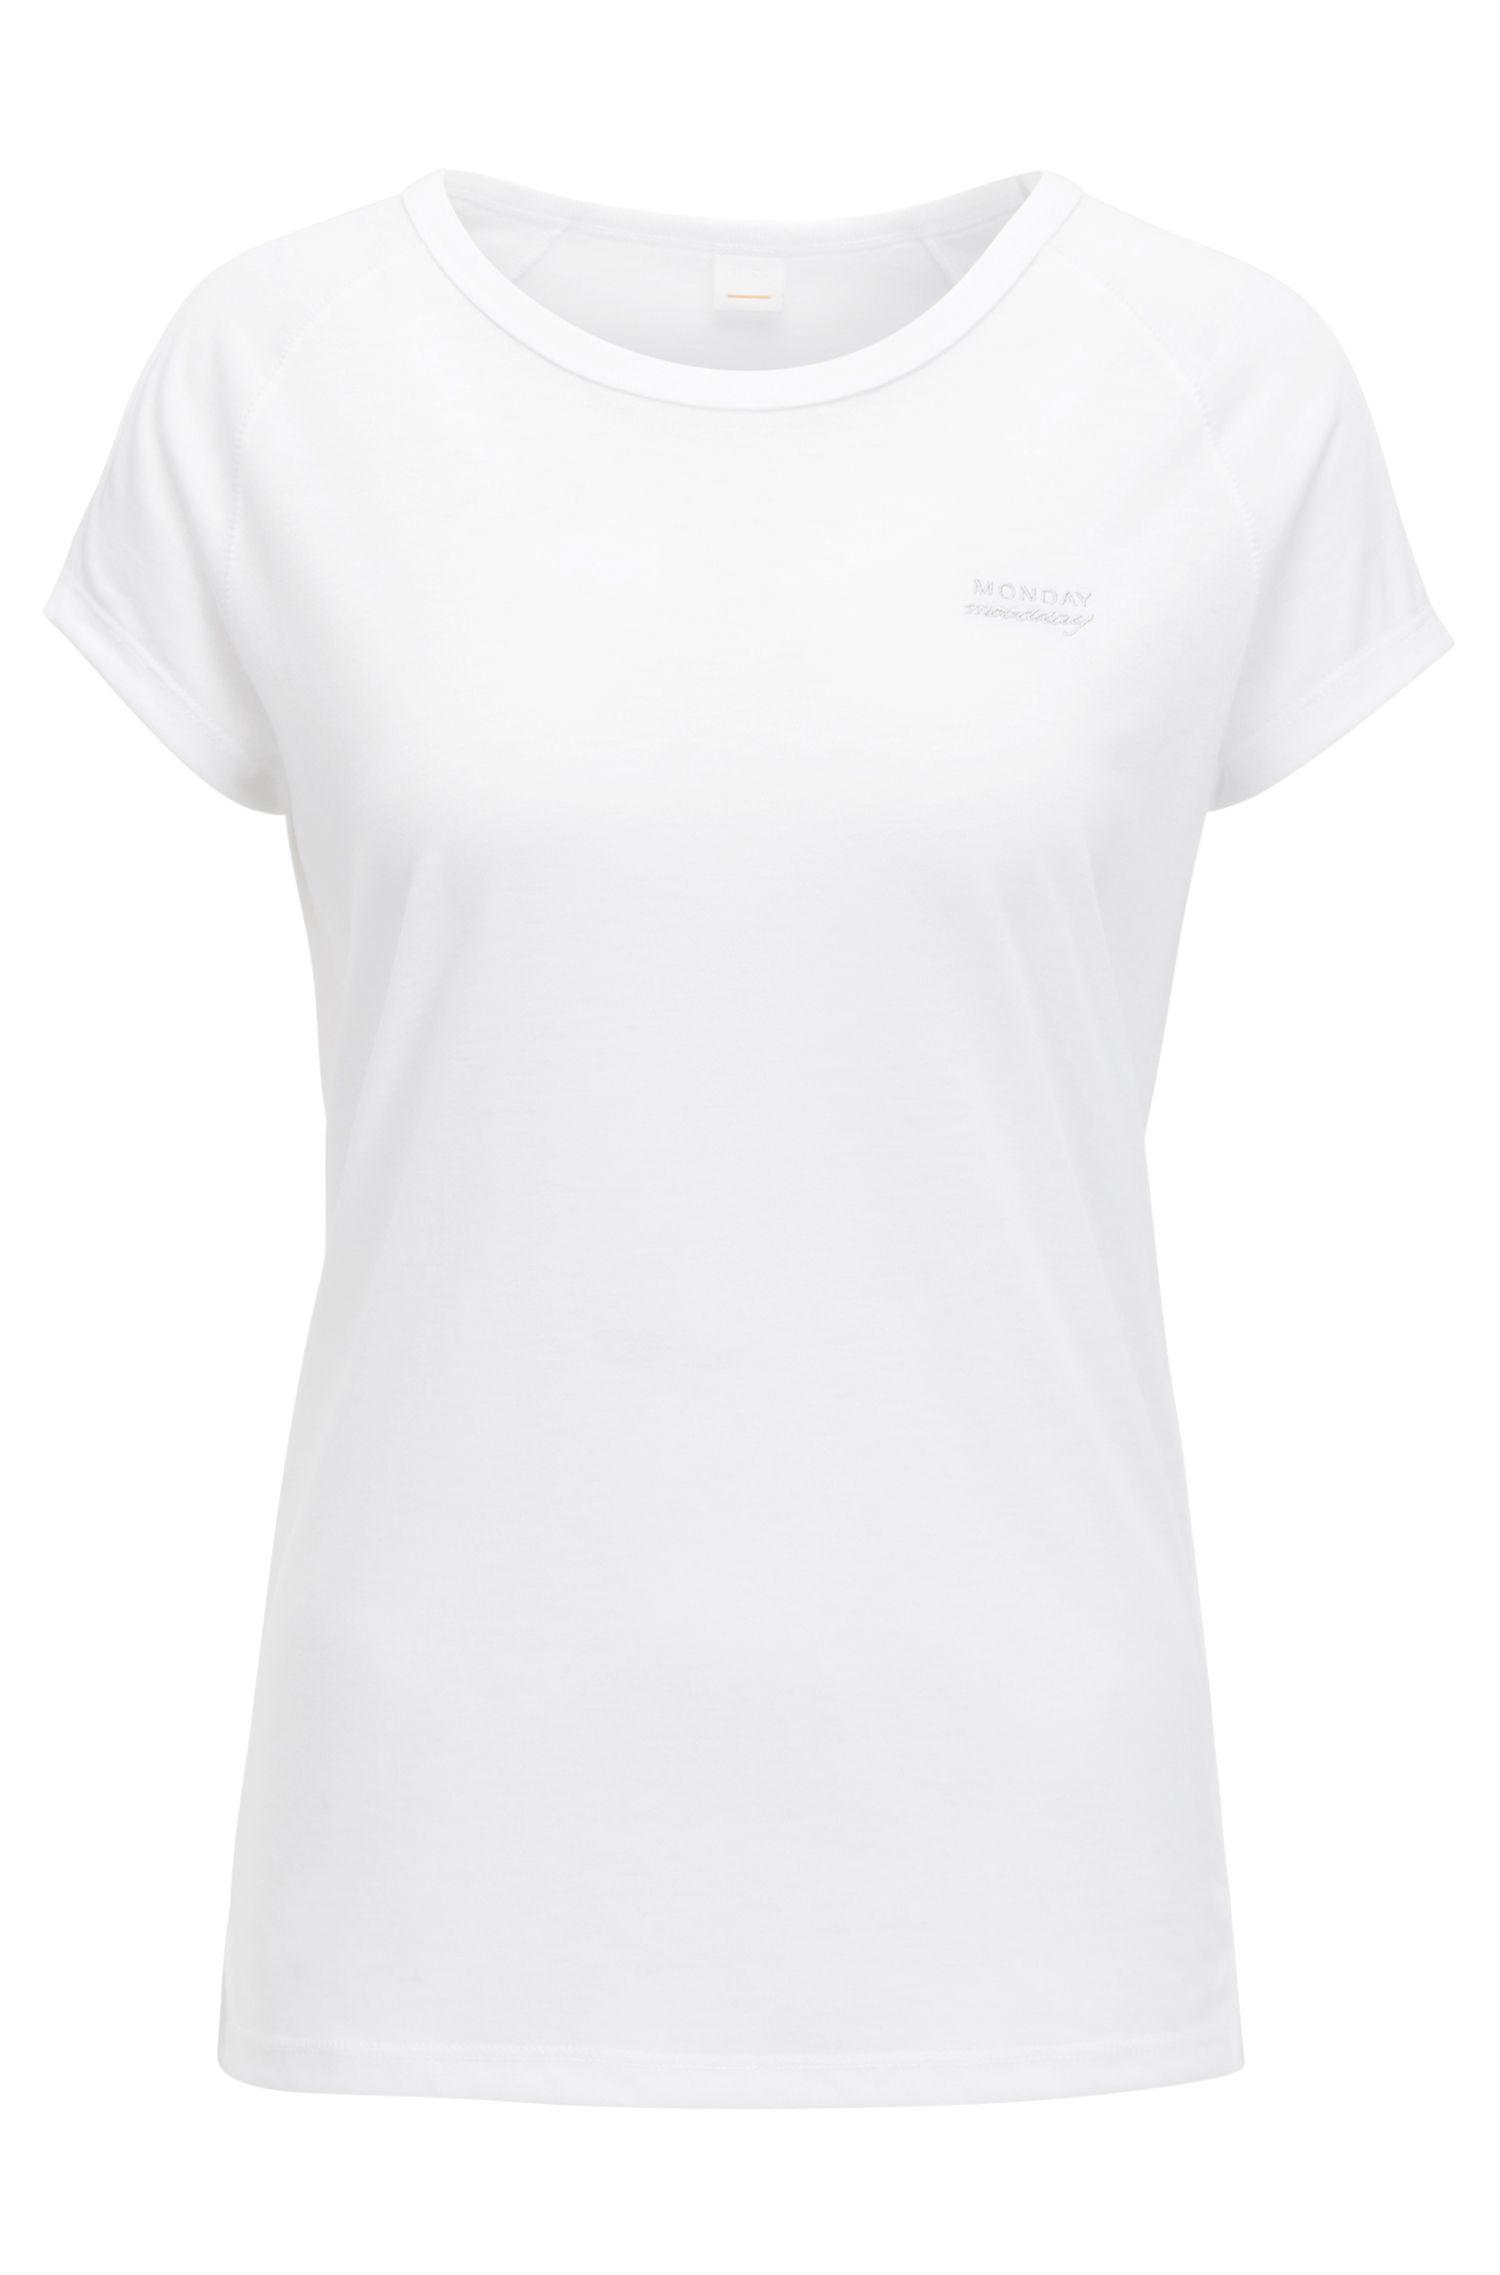 Slogan-detail mélange T-shirt with raglan sleeves